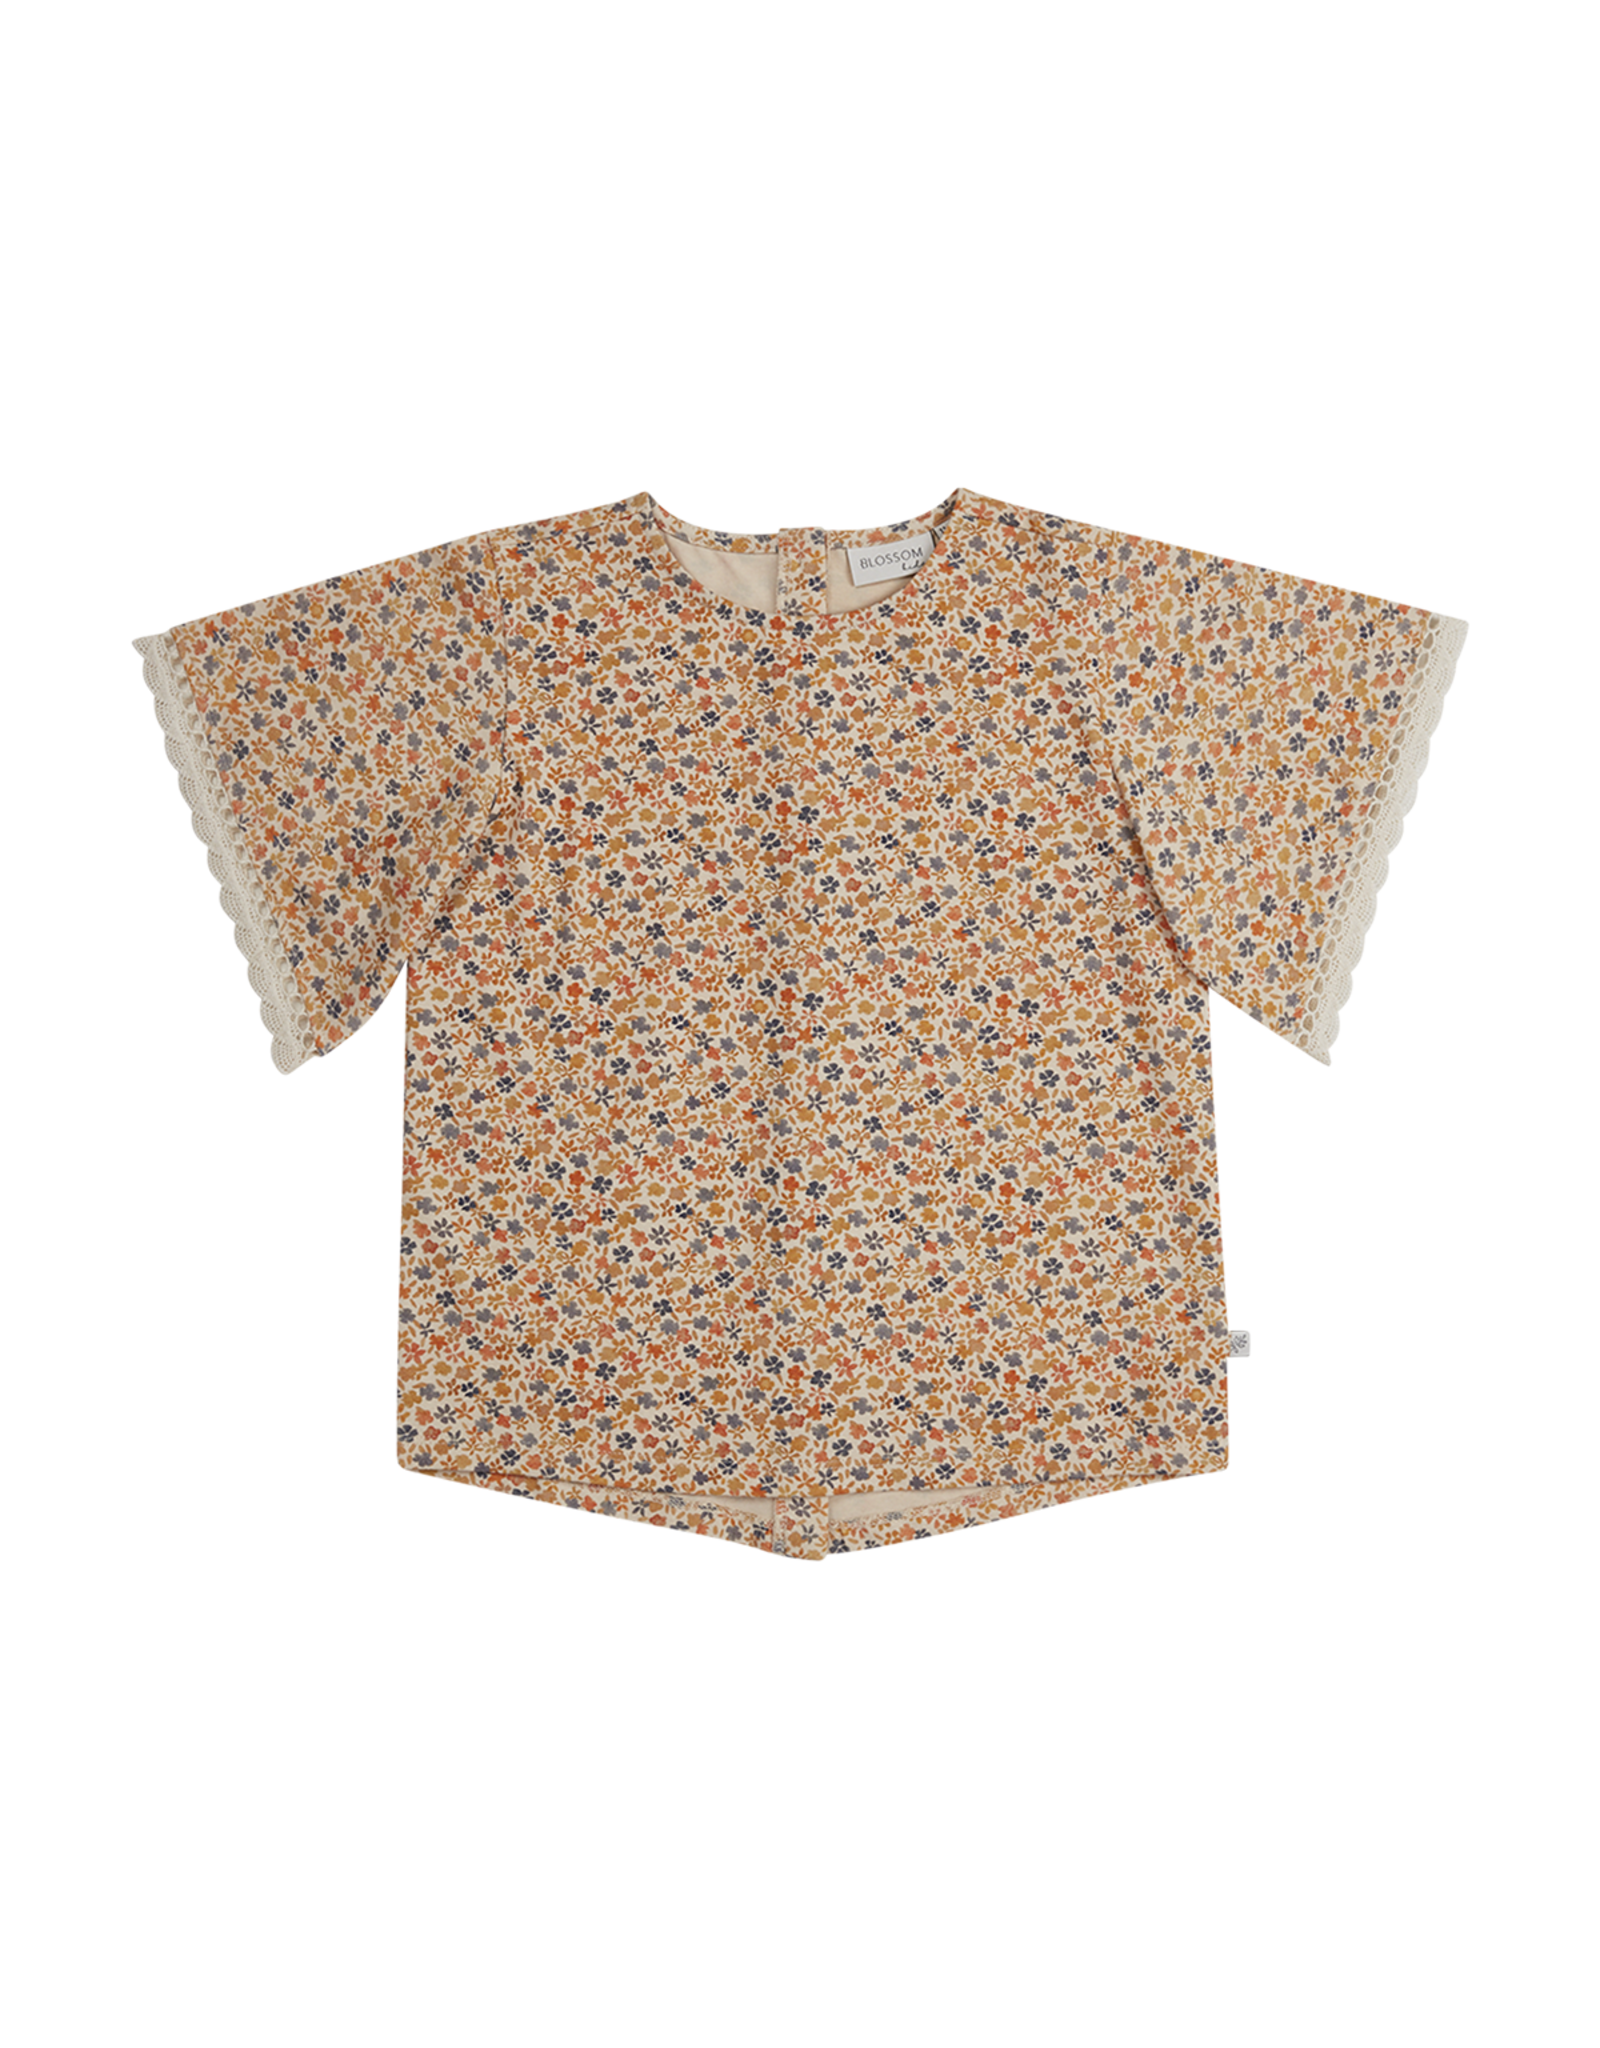 Blossom Kids BK - Tunic Short Sleeves Aquarel Flower